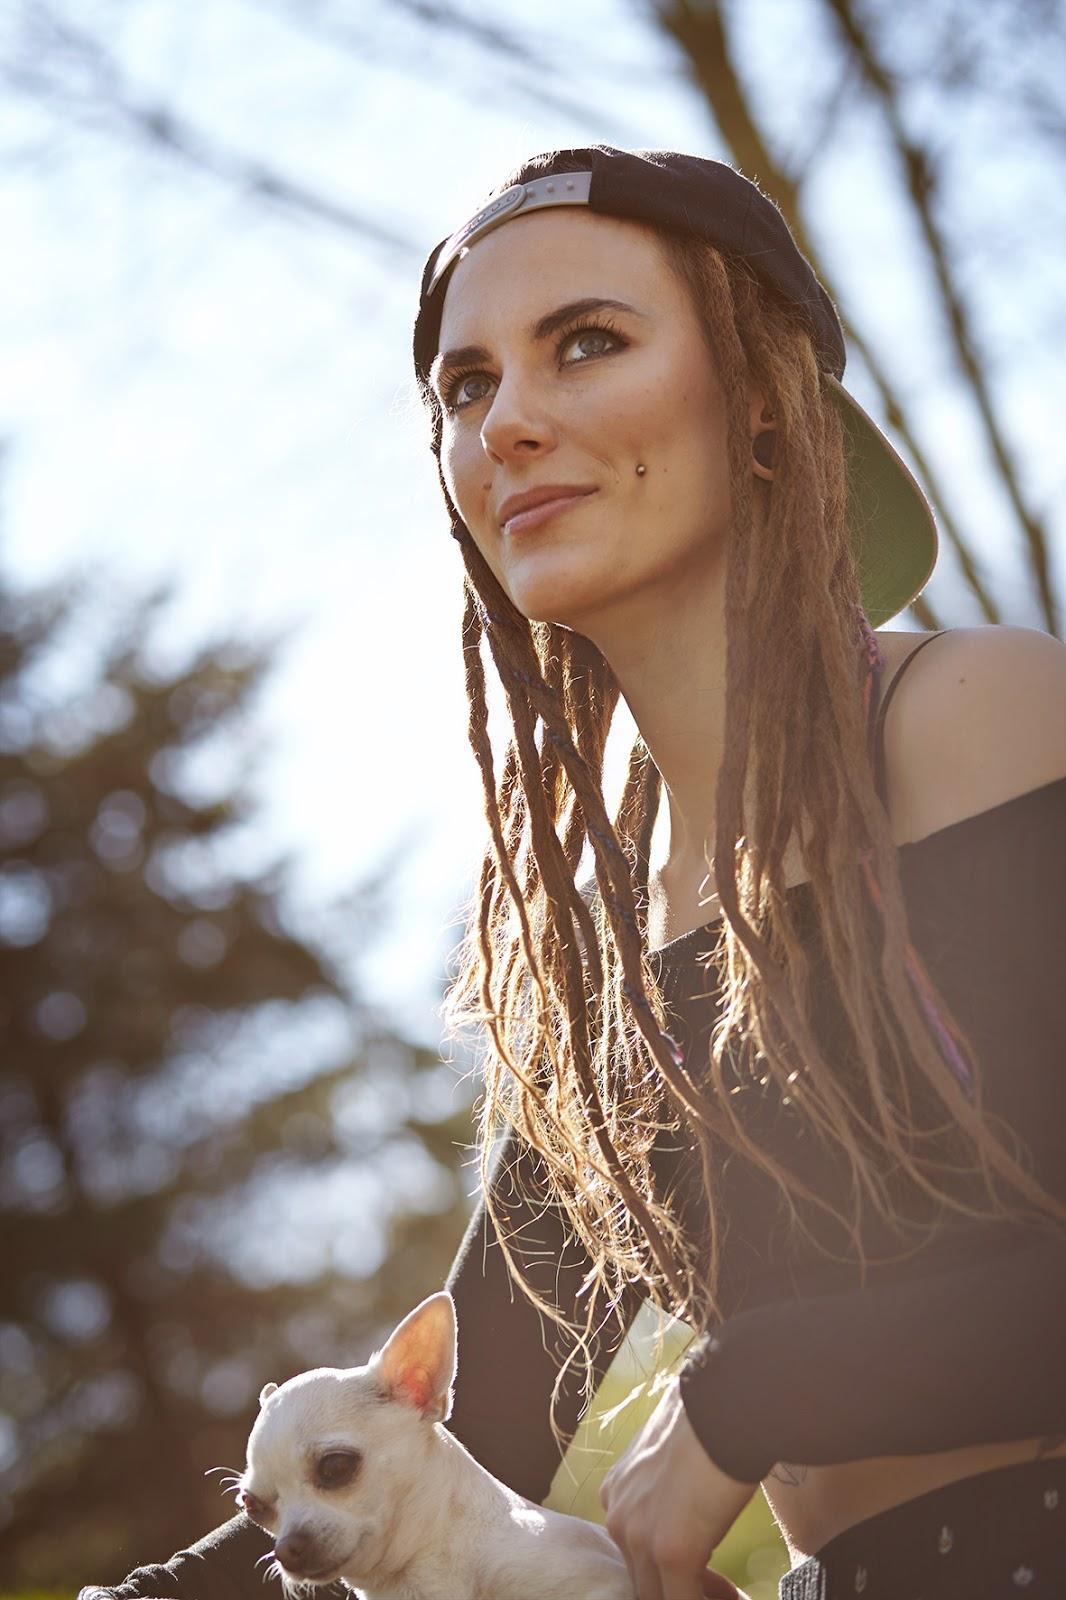 Corinna | Menschenskinder On Tour - Van Rutherford Photography